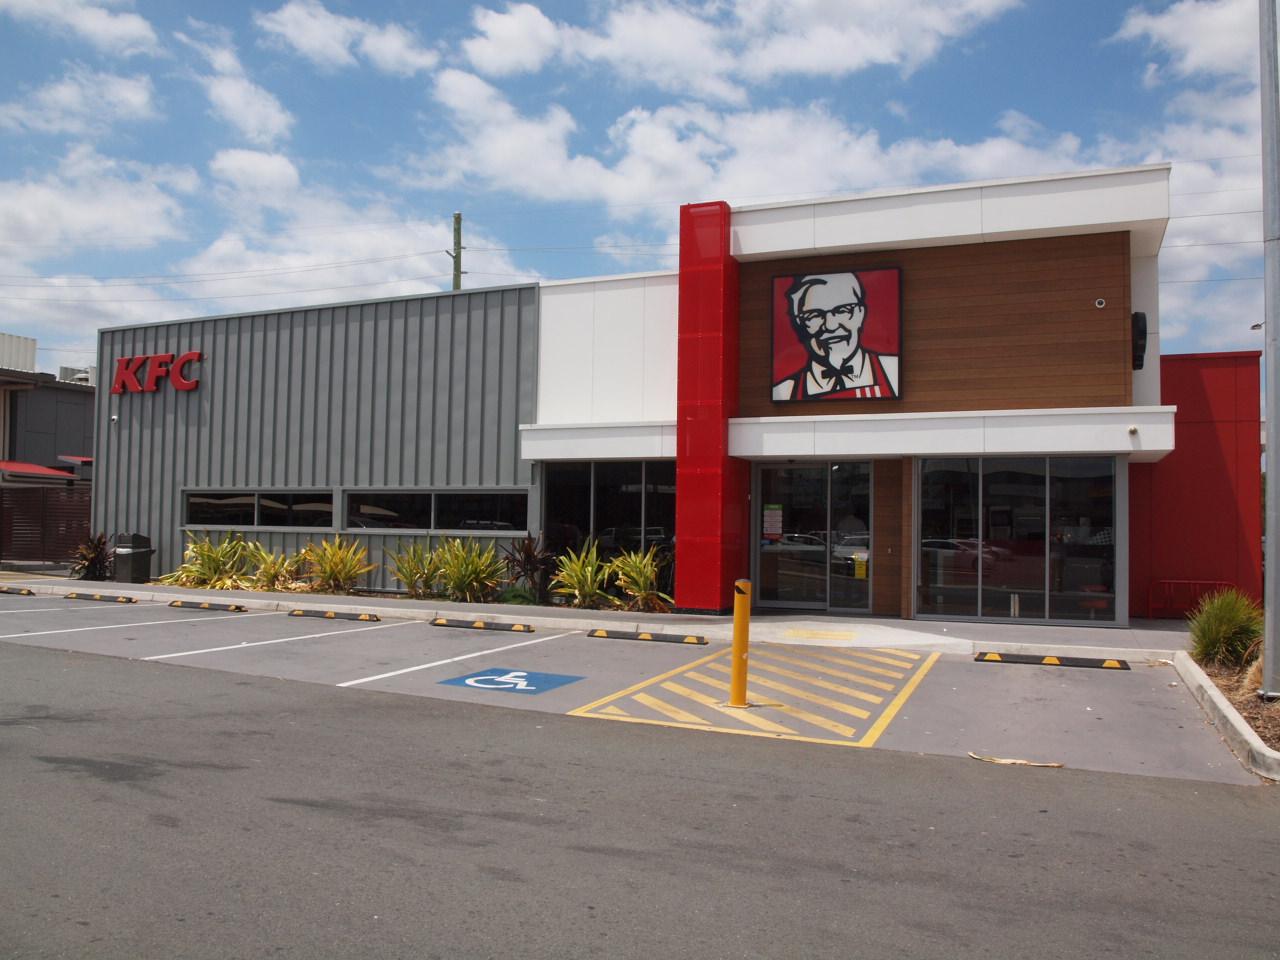 KFC Redbank